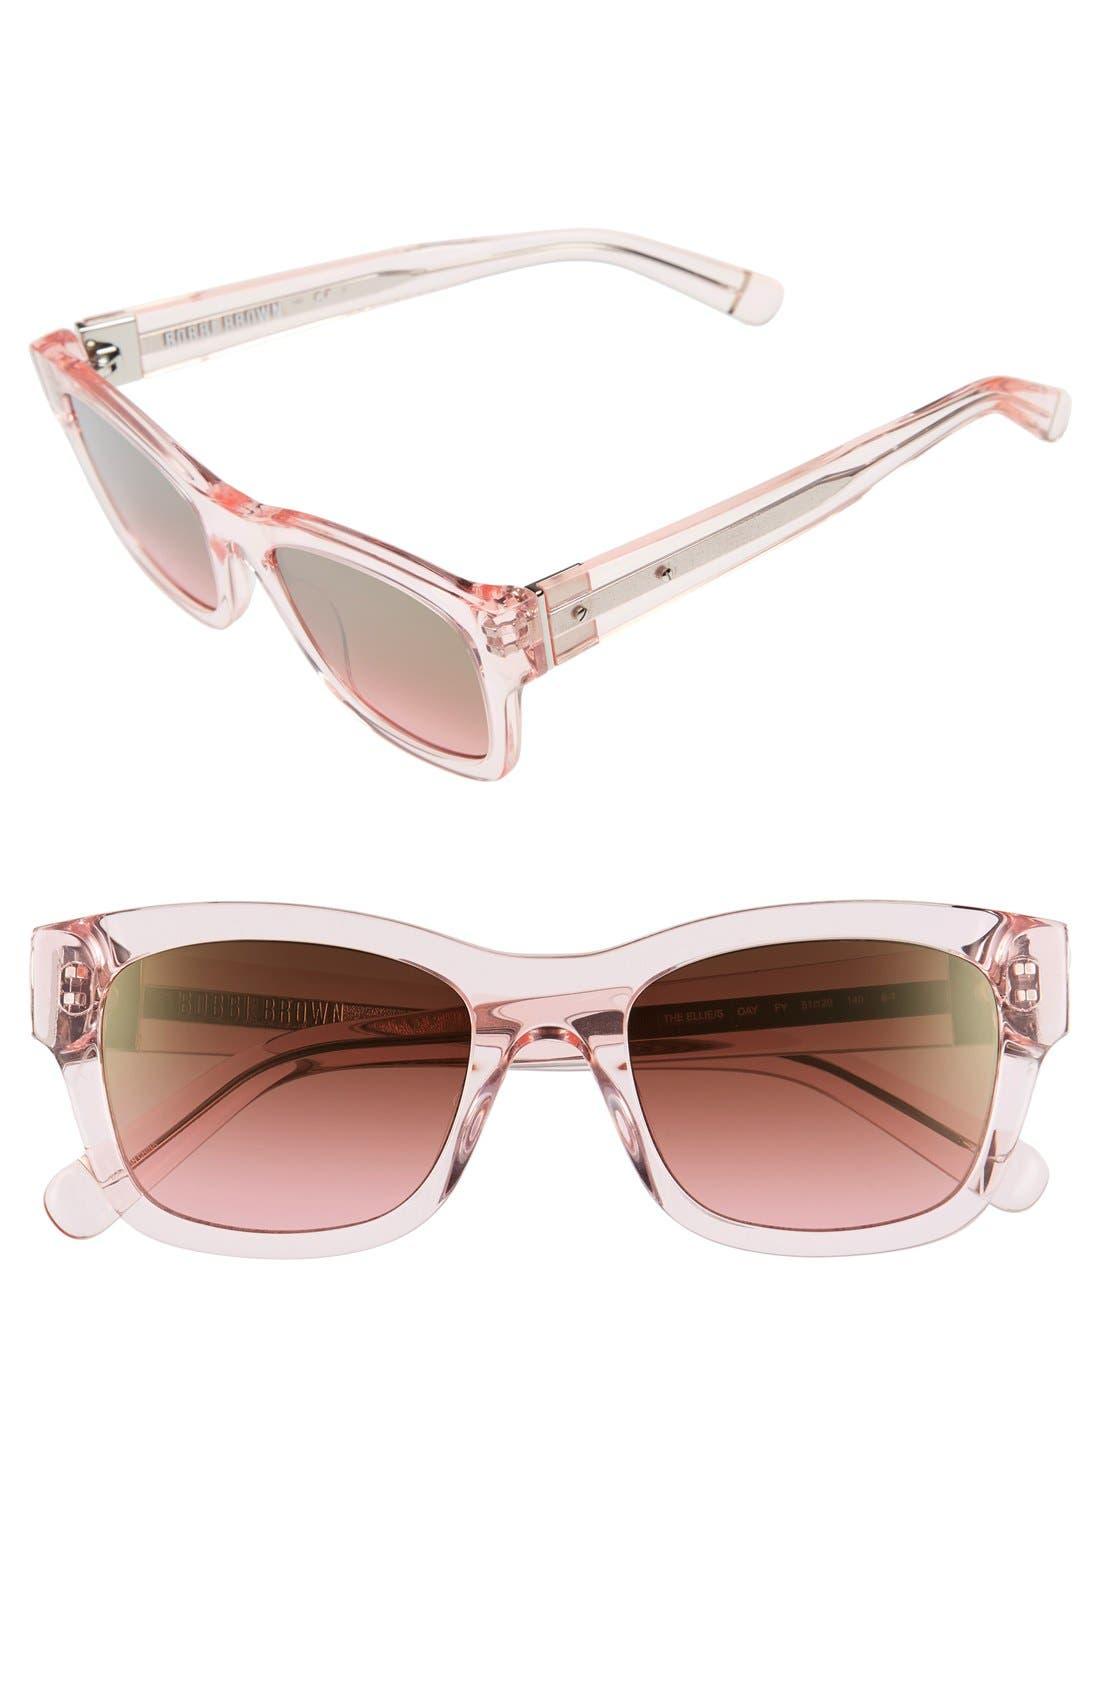 Main Image - Bobbi Brown 'The Ellie' 51mm Sunglasses